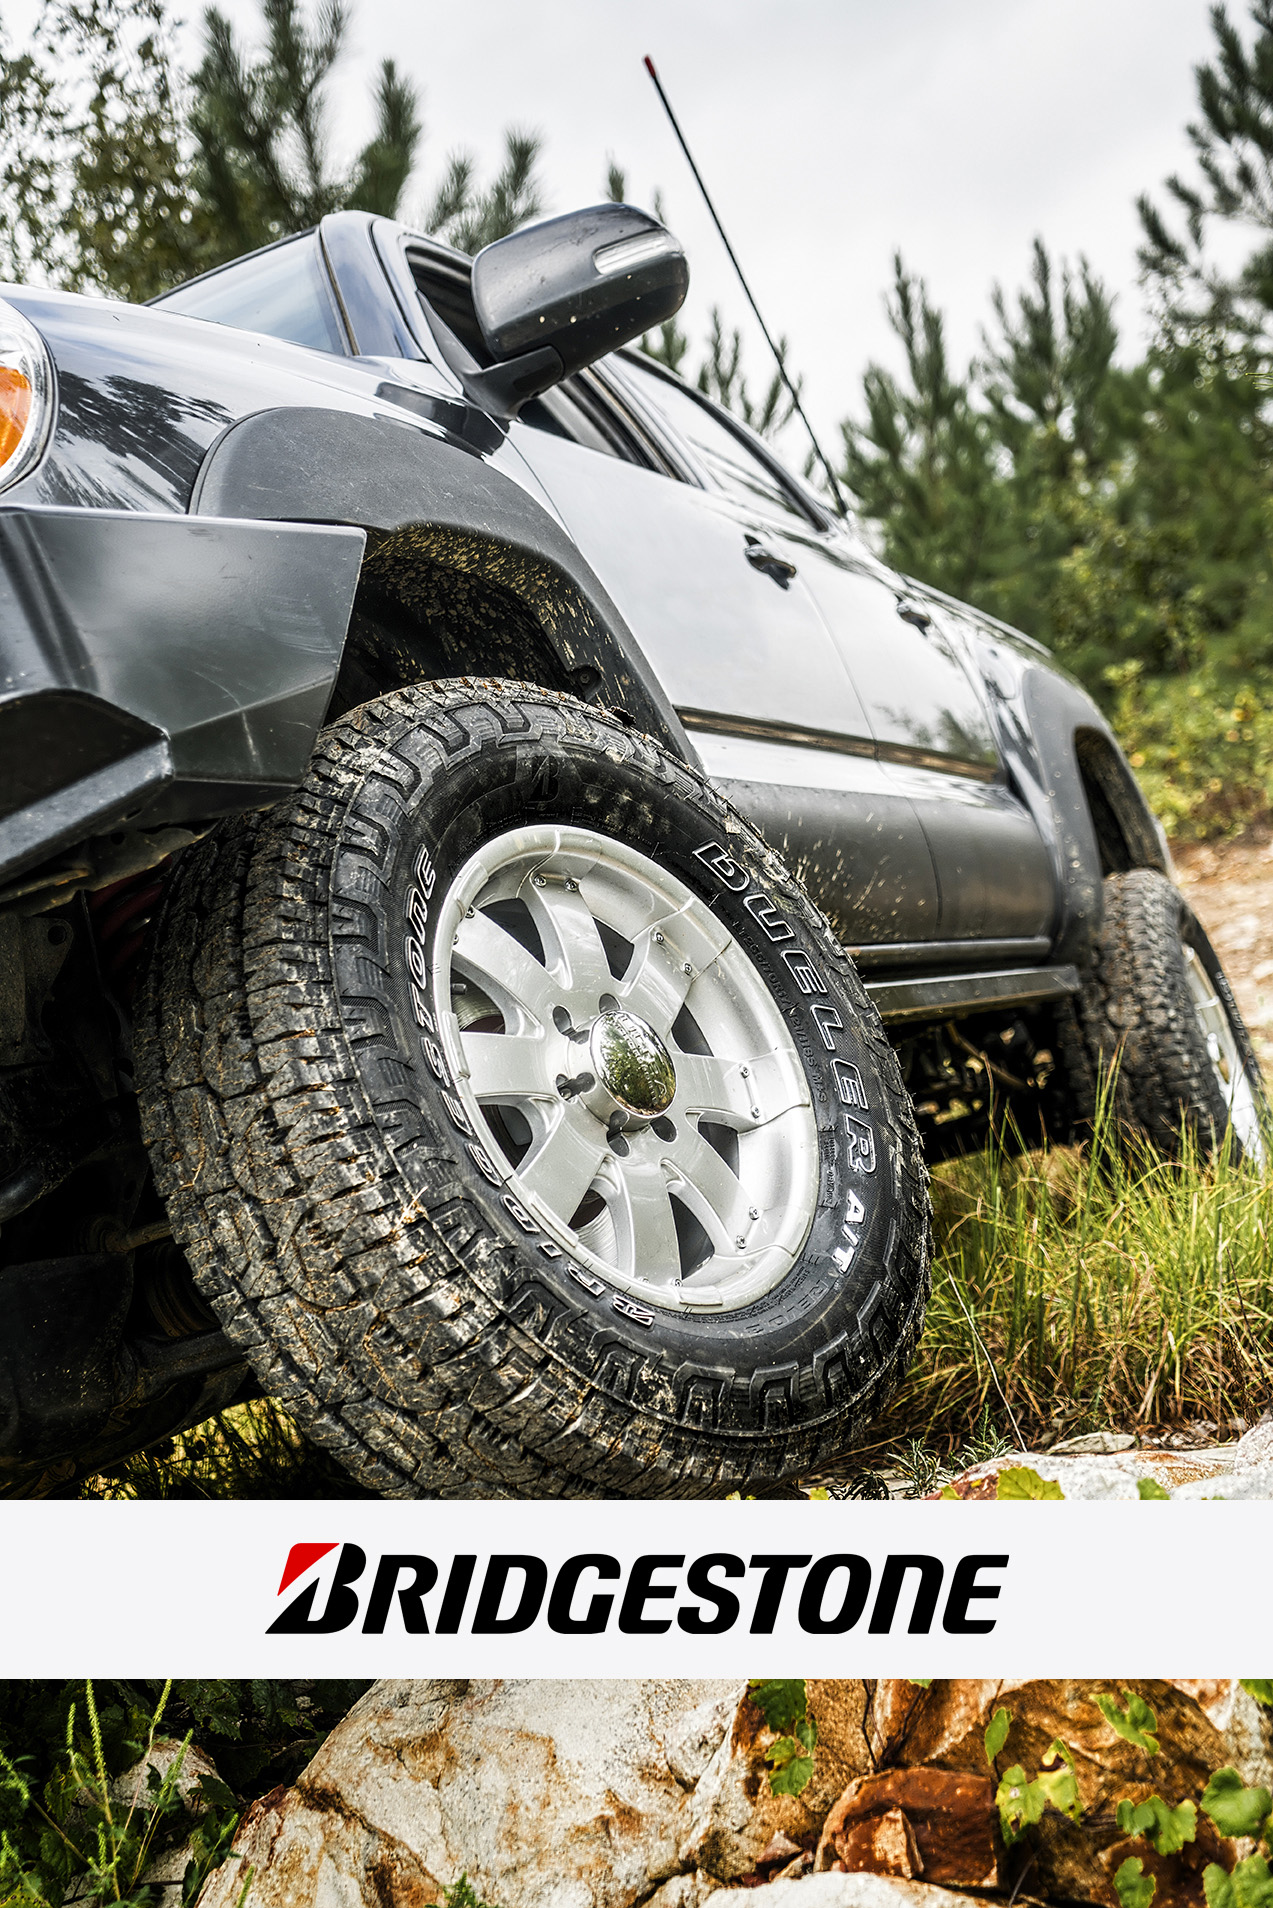 Bridgestone-155_WebResolution_FullSize copy.jpg